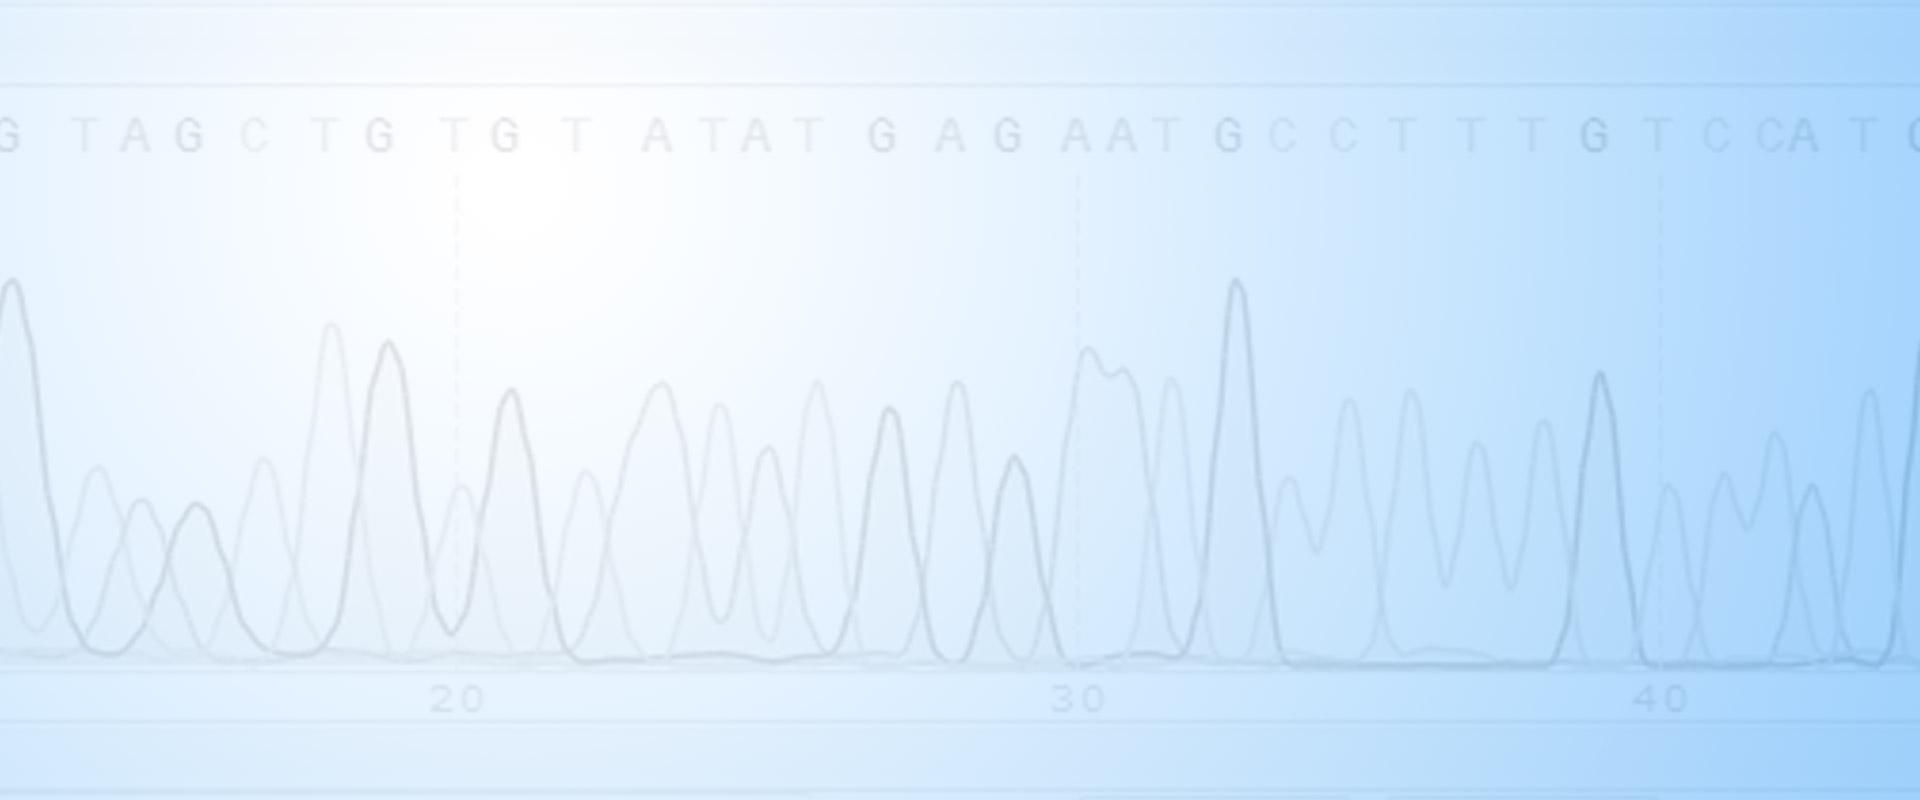 SnapGene | Software for everyday molecular biology